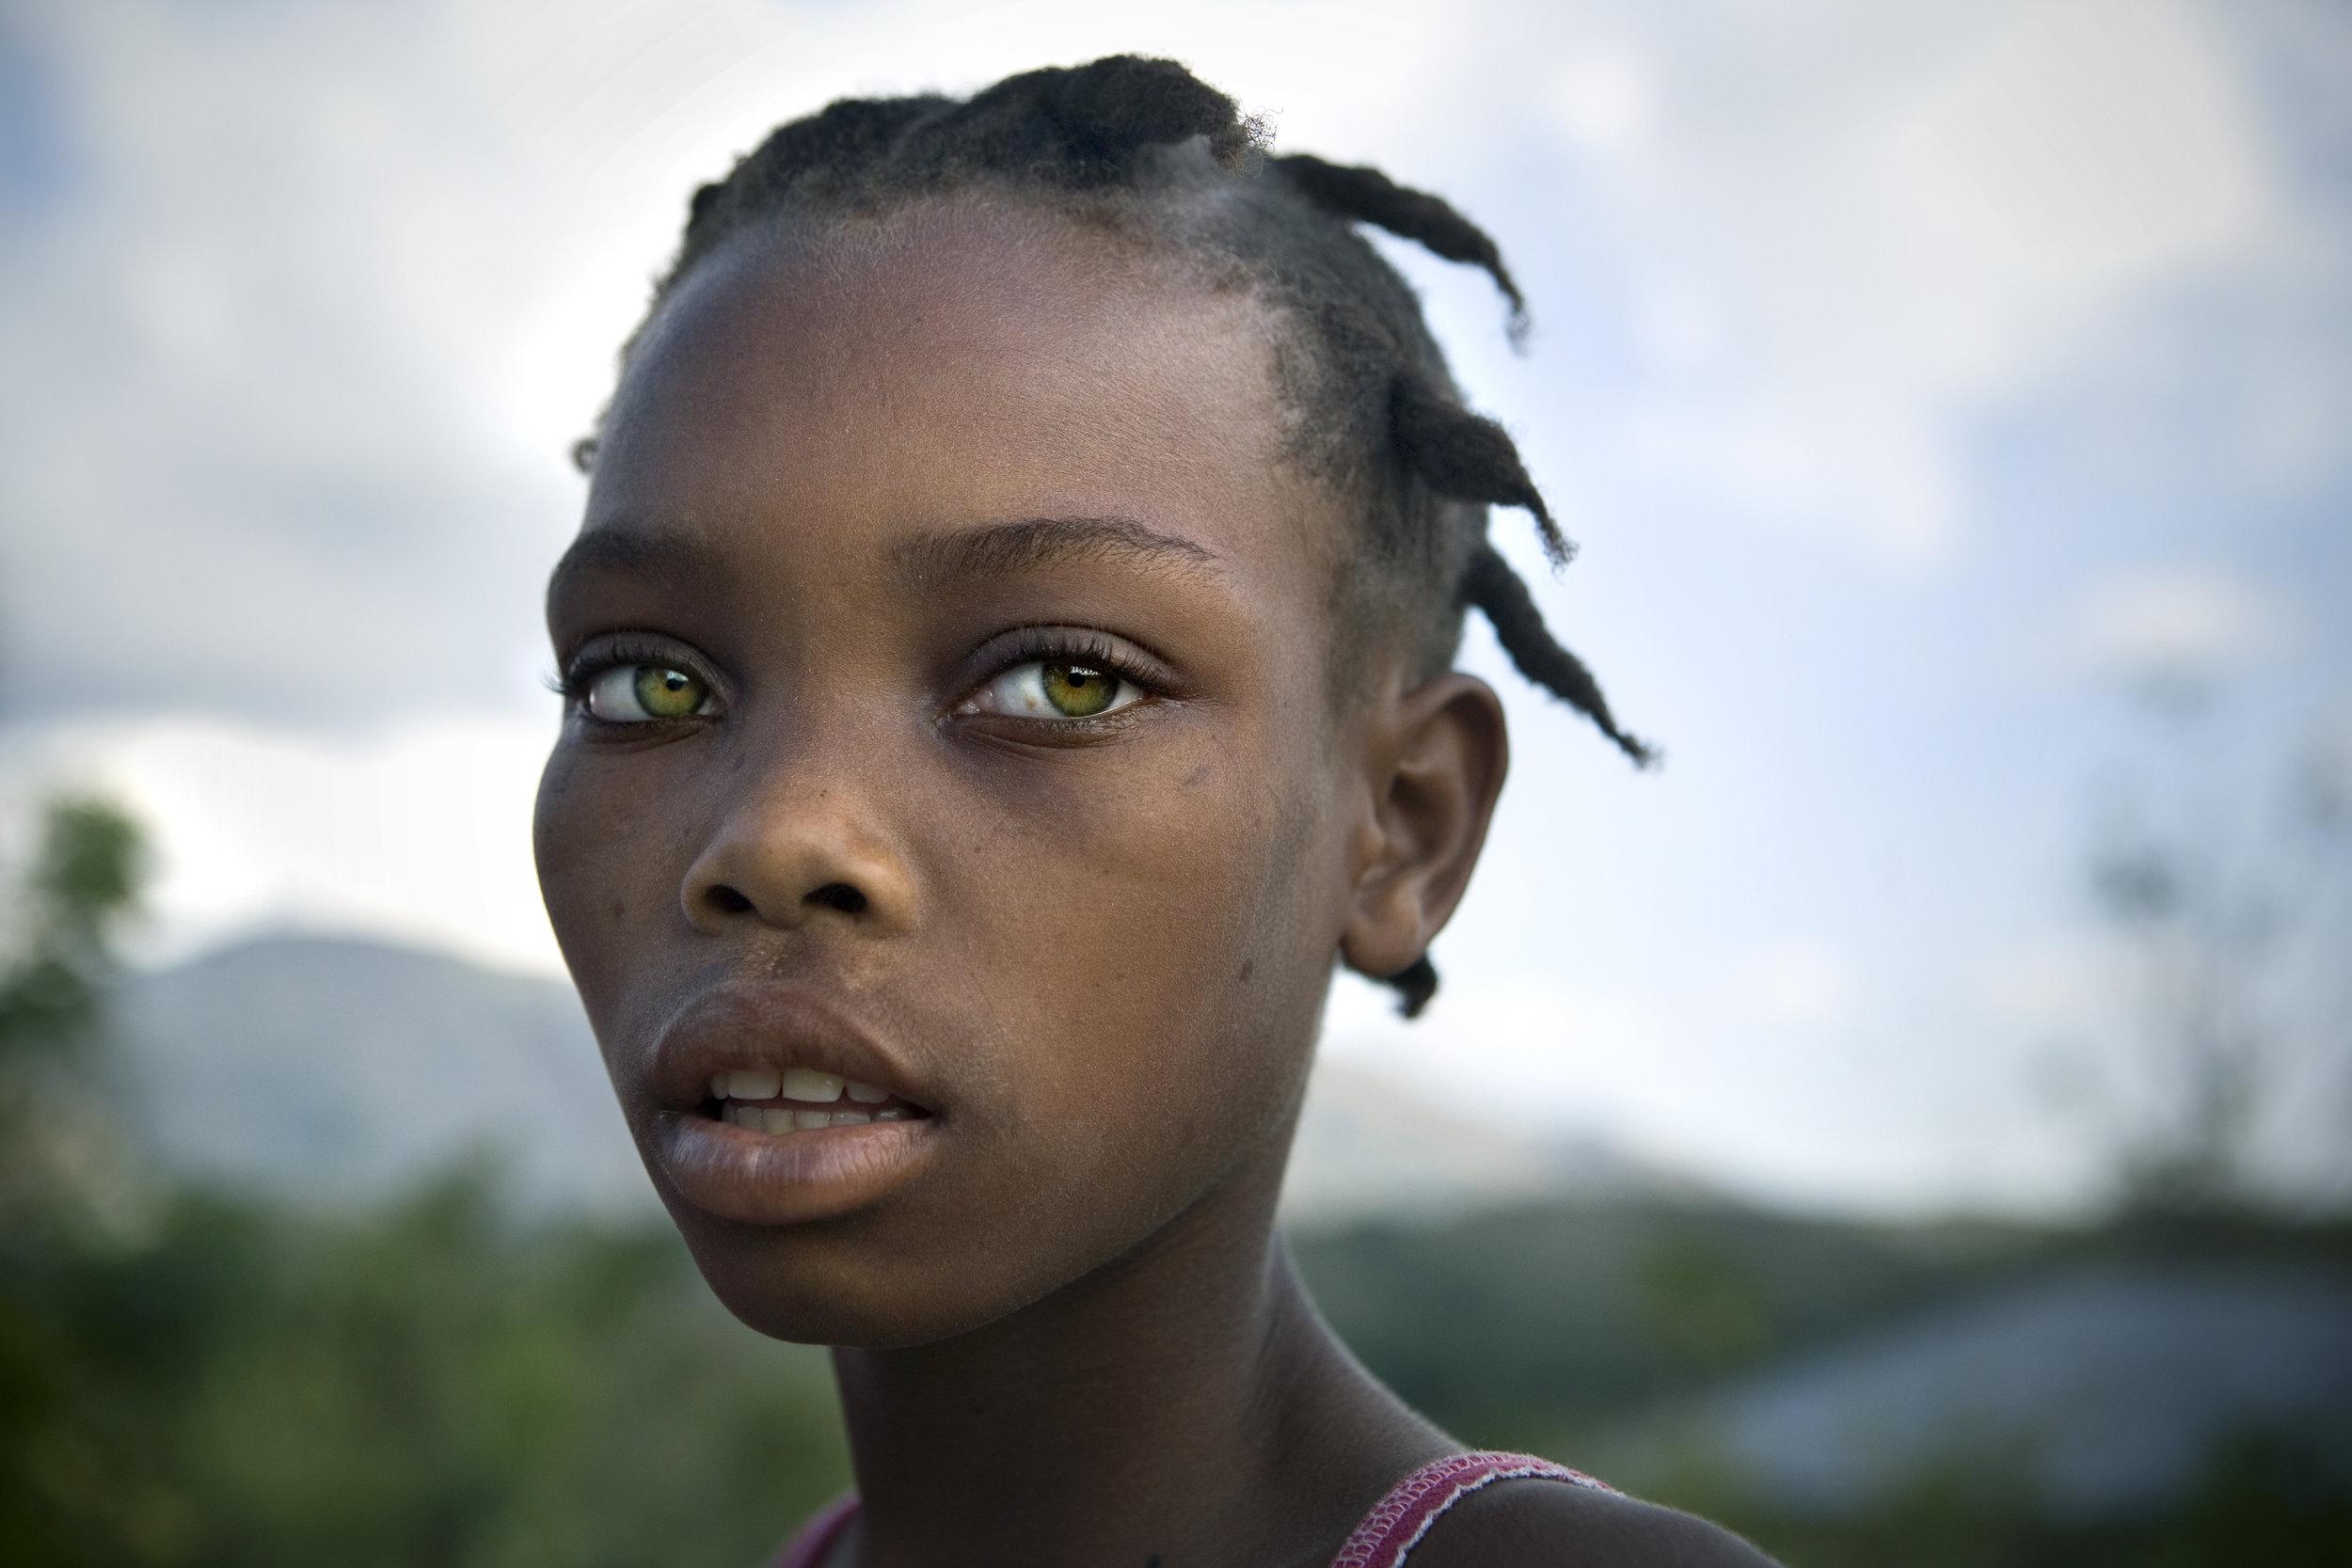 Jenny Duqai, 12, outside her home in Gros-Morne, Haiti.